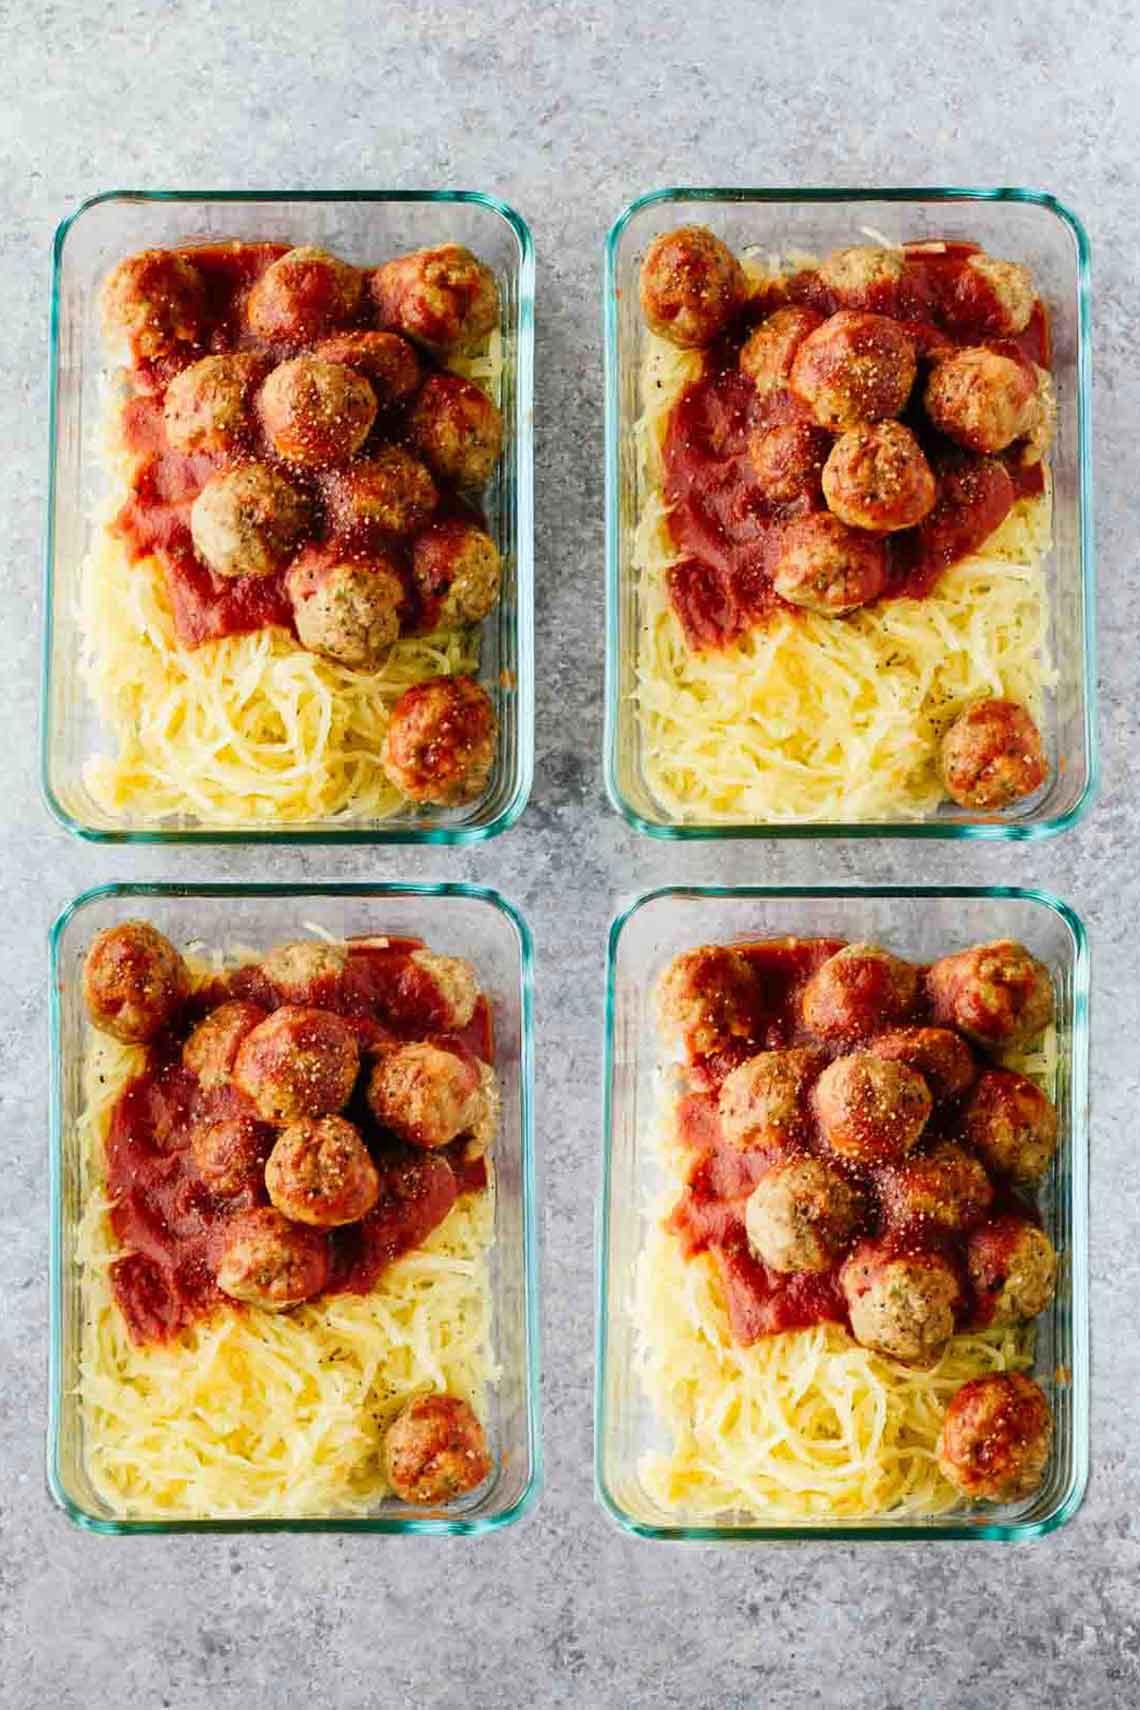 Meatball Dinners Ideas  Paleo Turkey Meatballs Meal Prep Bowls Jar Lemons